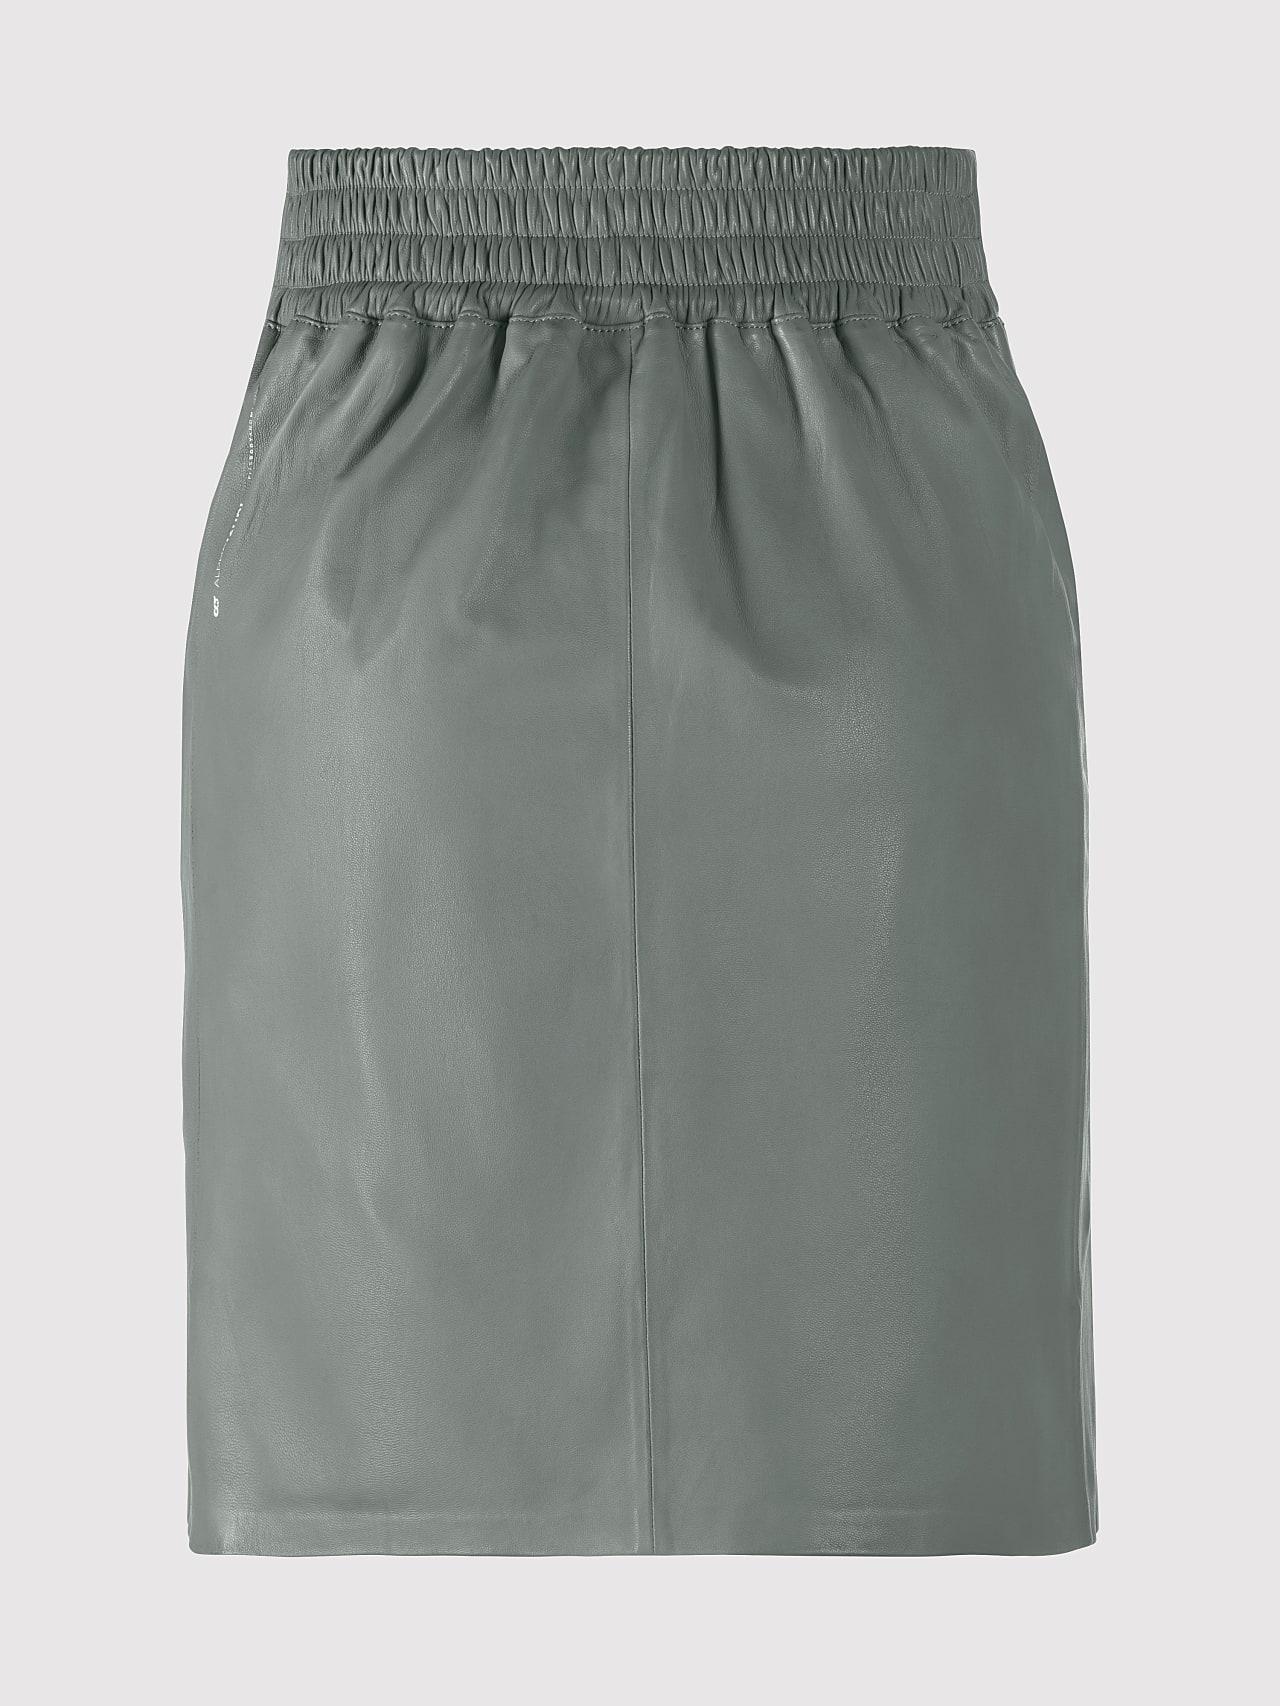 LEXSI V1.Y5.01 Leather Pencil Skirt Grey Left Alpha Tauri